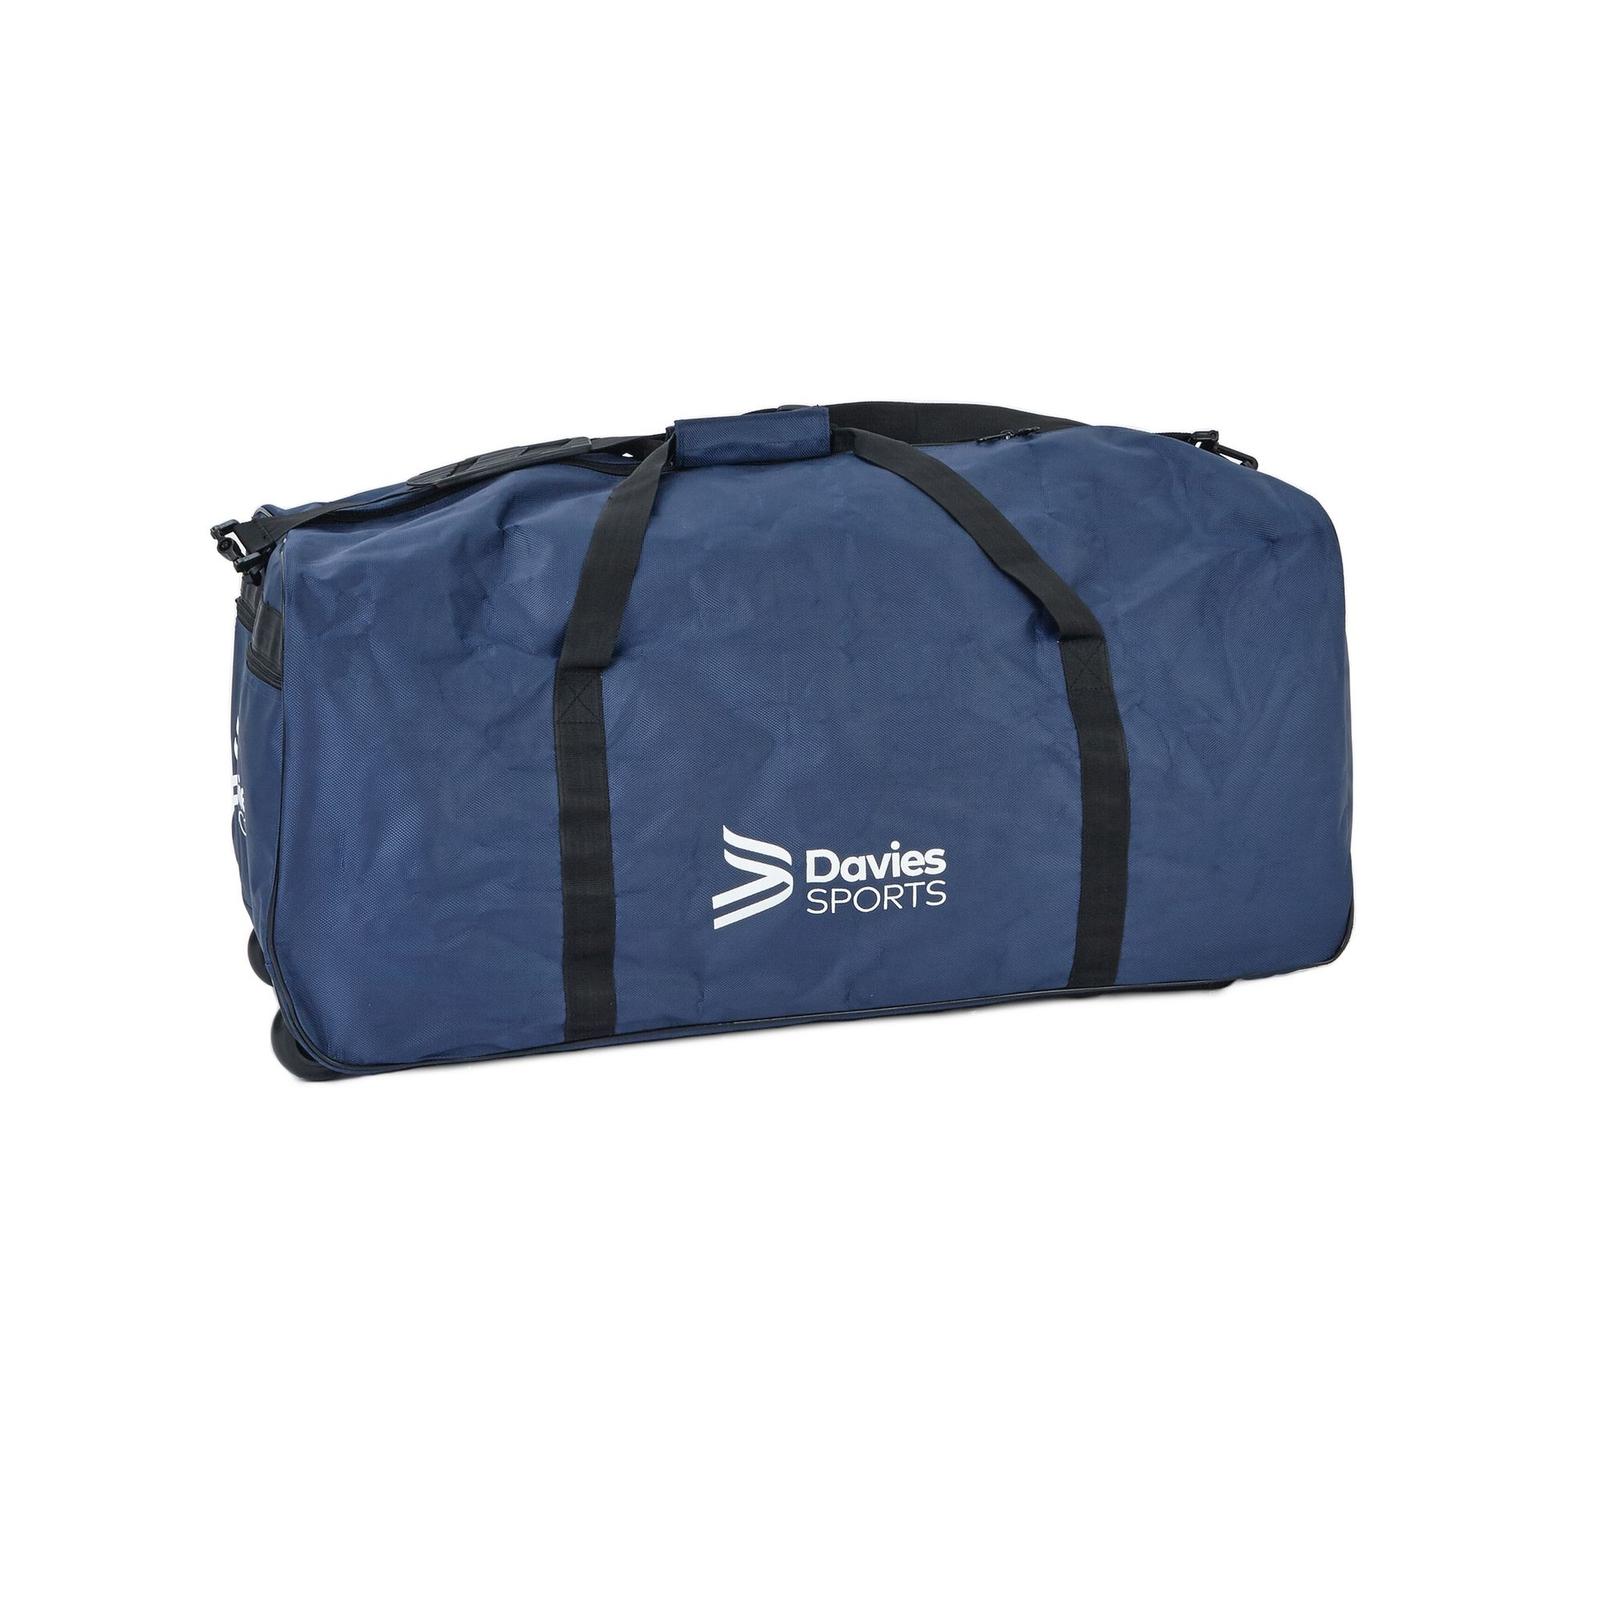 Davies Sports Team Bag With Wheels